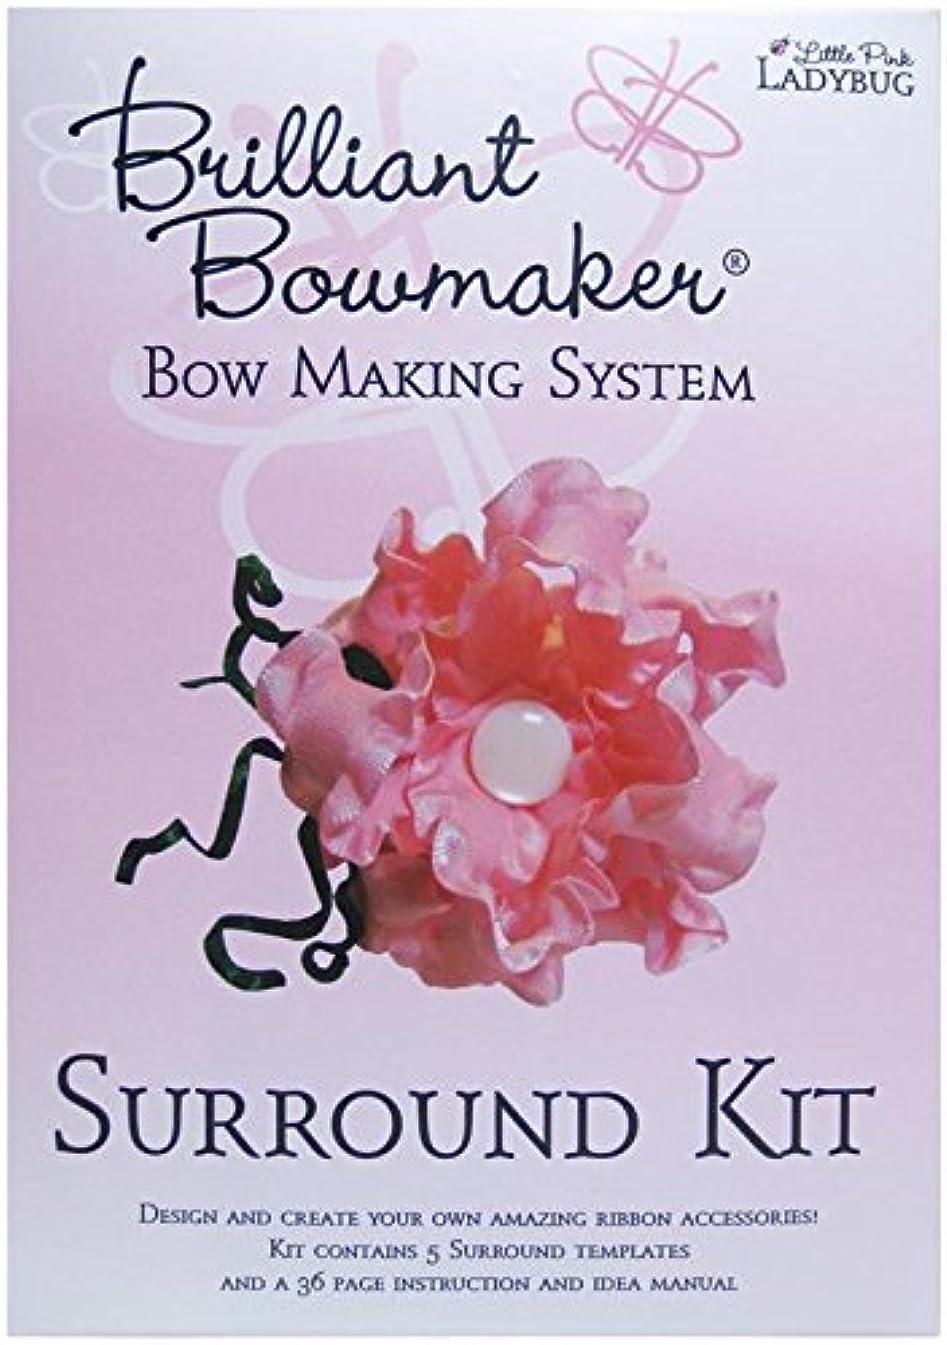 Little Pink Ladybug LPL0104 Brilliant Bowmaker Surround Kit